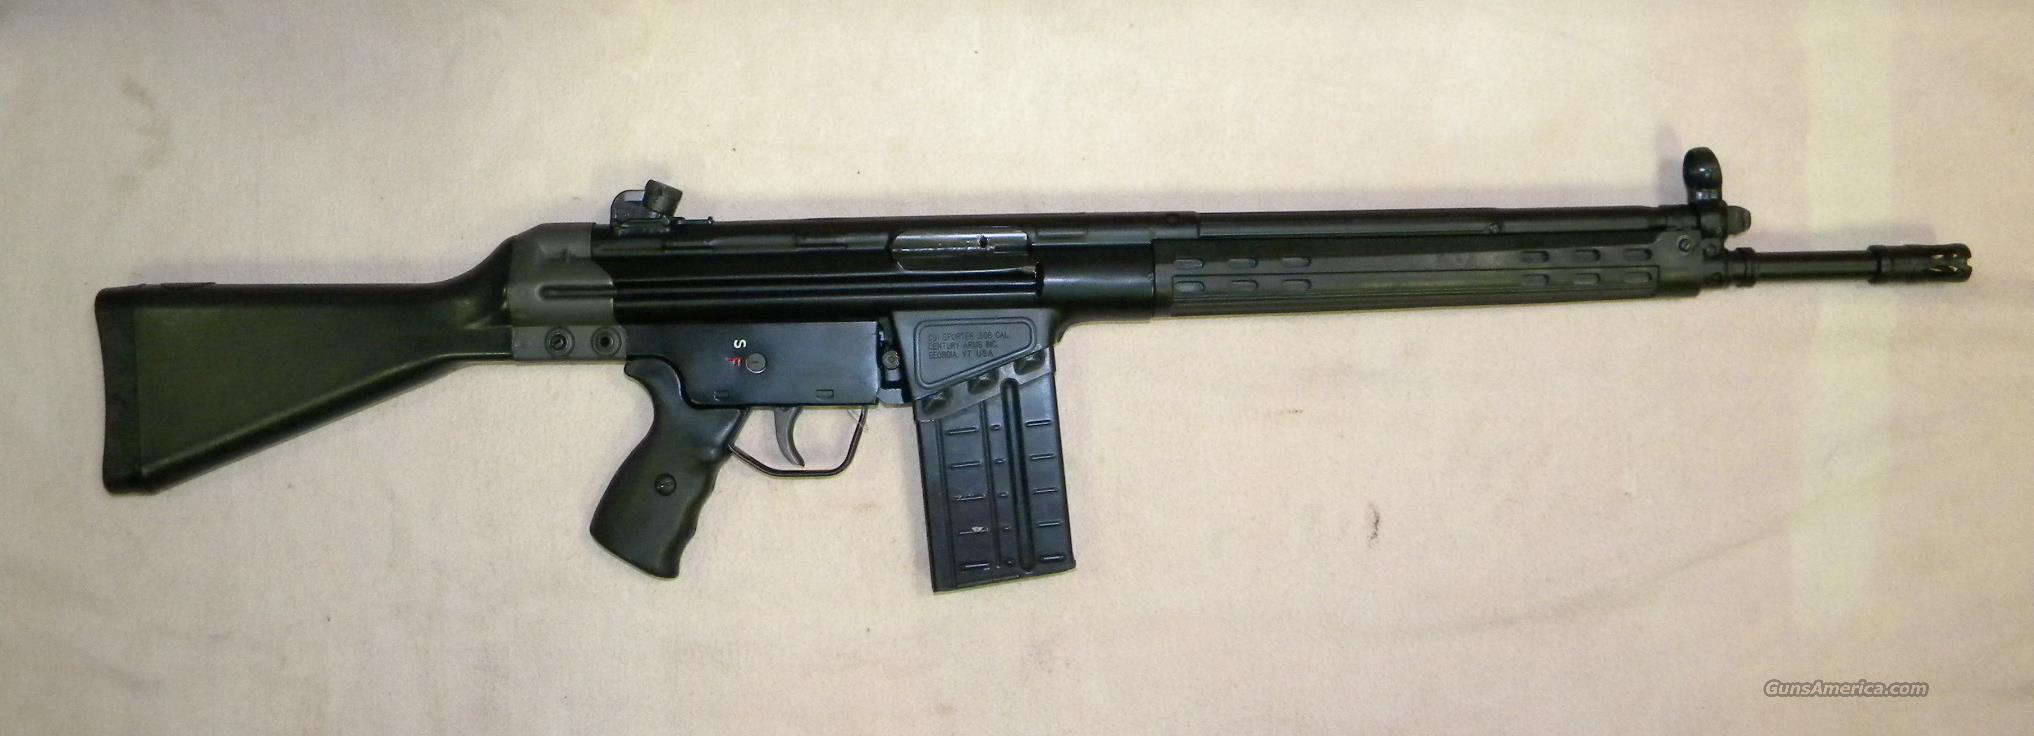 Century Arms C-91 Sporter, .308, All New Mfg  Guns > Rifles > Century International Arms - Rifles > Rifles